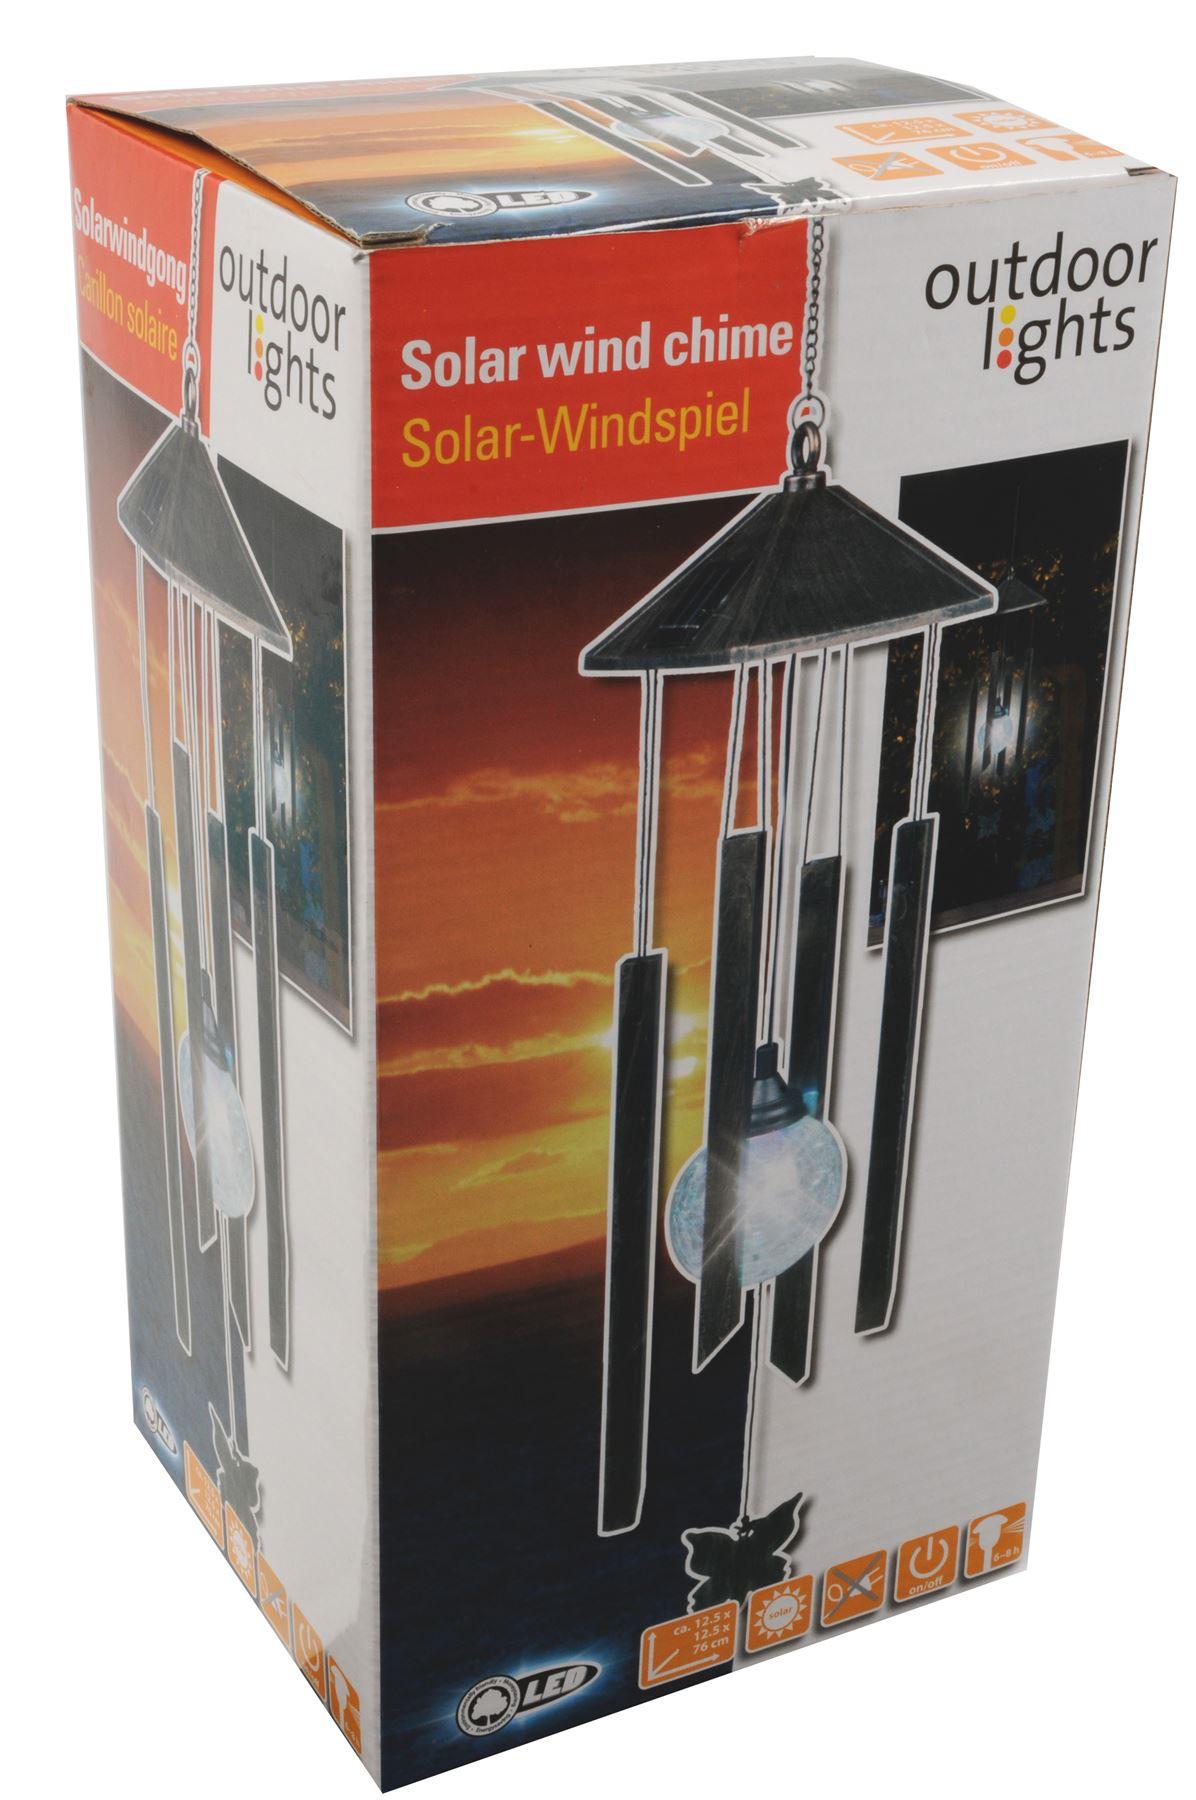 solar led wind chime black for outdoor lights with on off. Black Bedroom Furniture Sets. Home Design Ideas